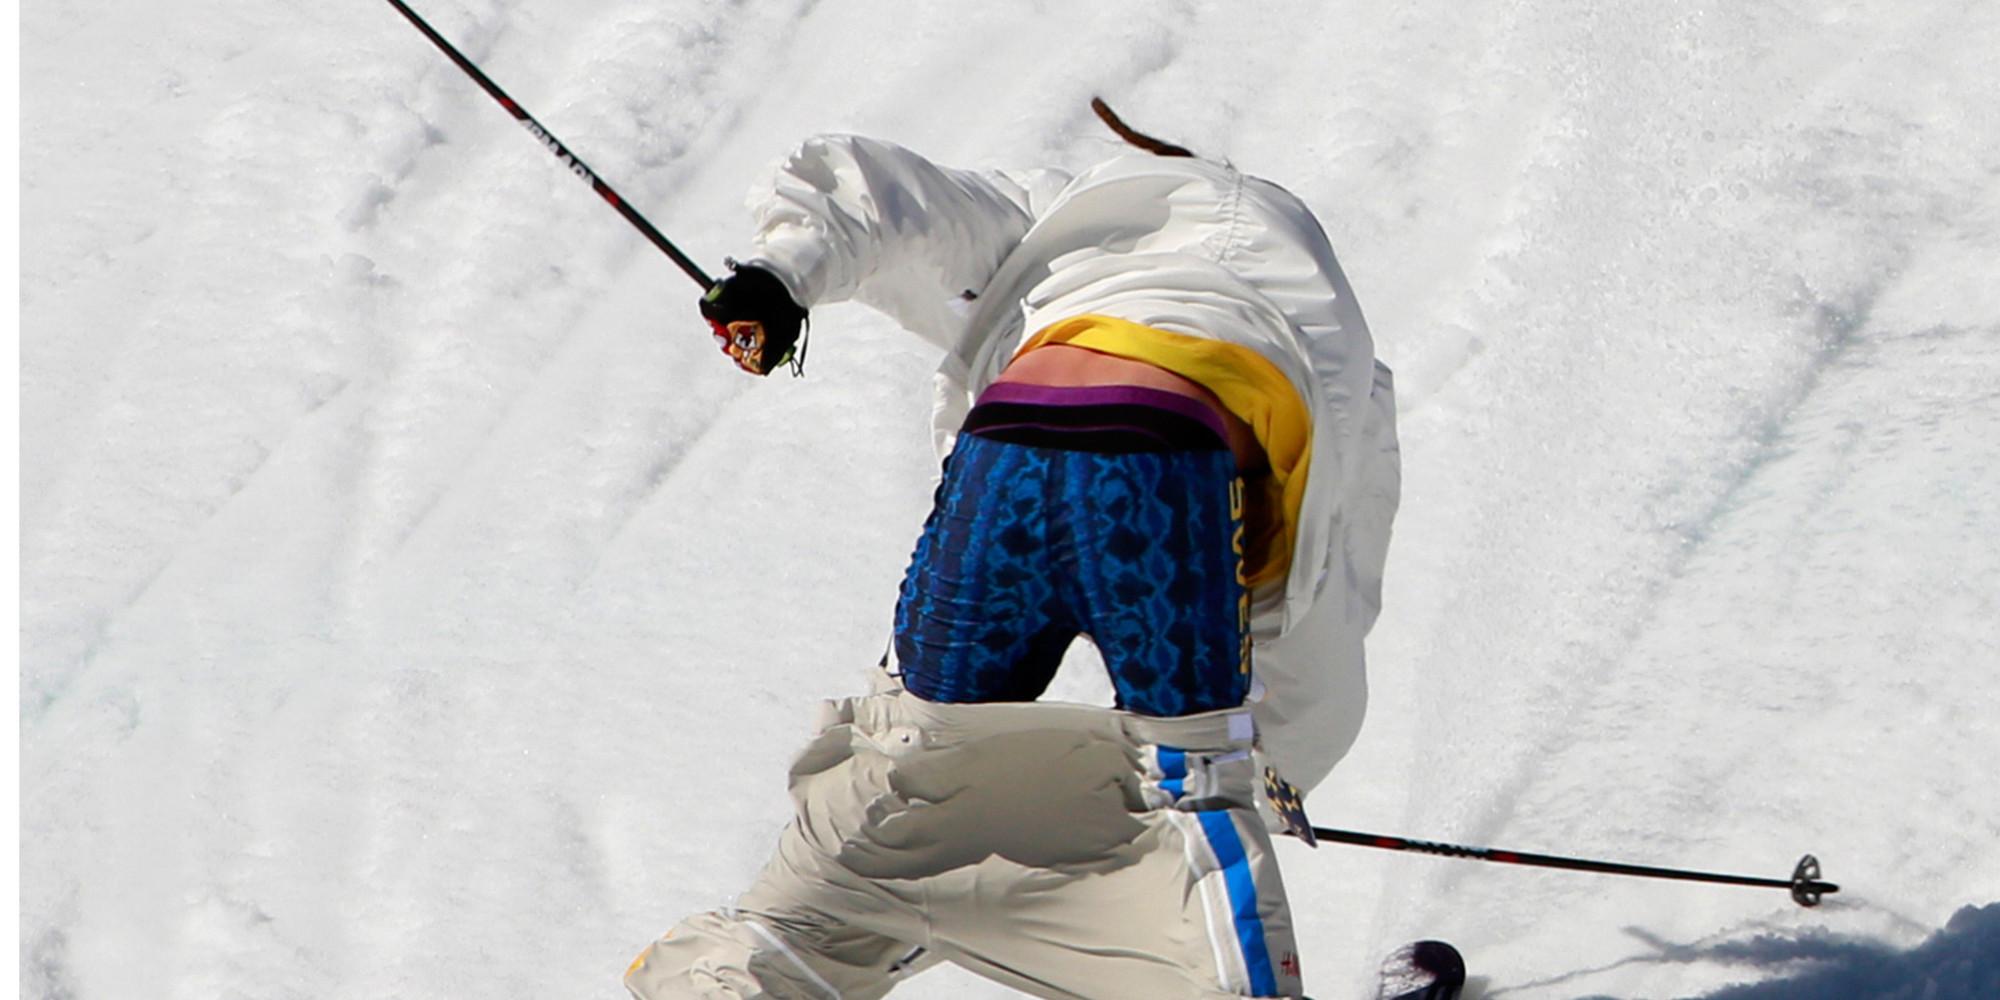 Sochi 2014 Freestyler Henrik Harlaut S Ski Pants Fall